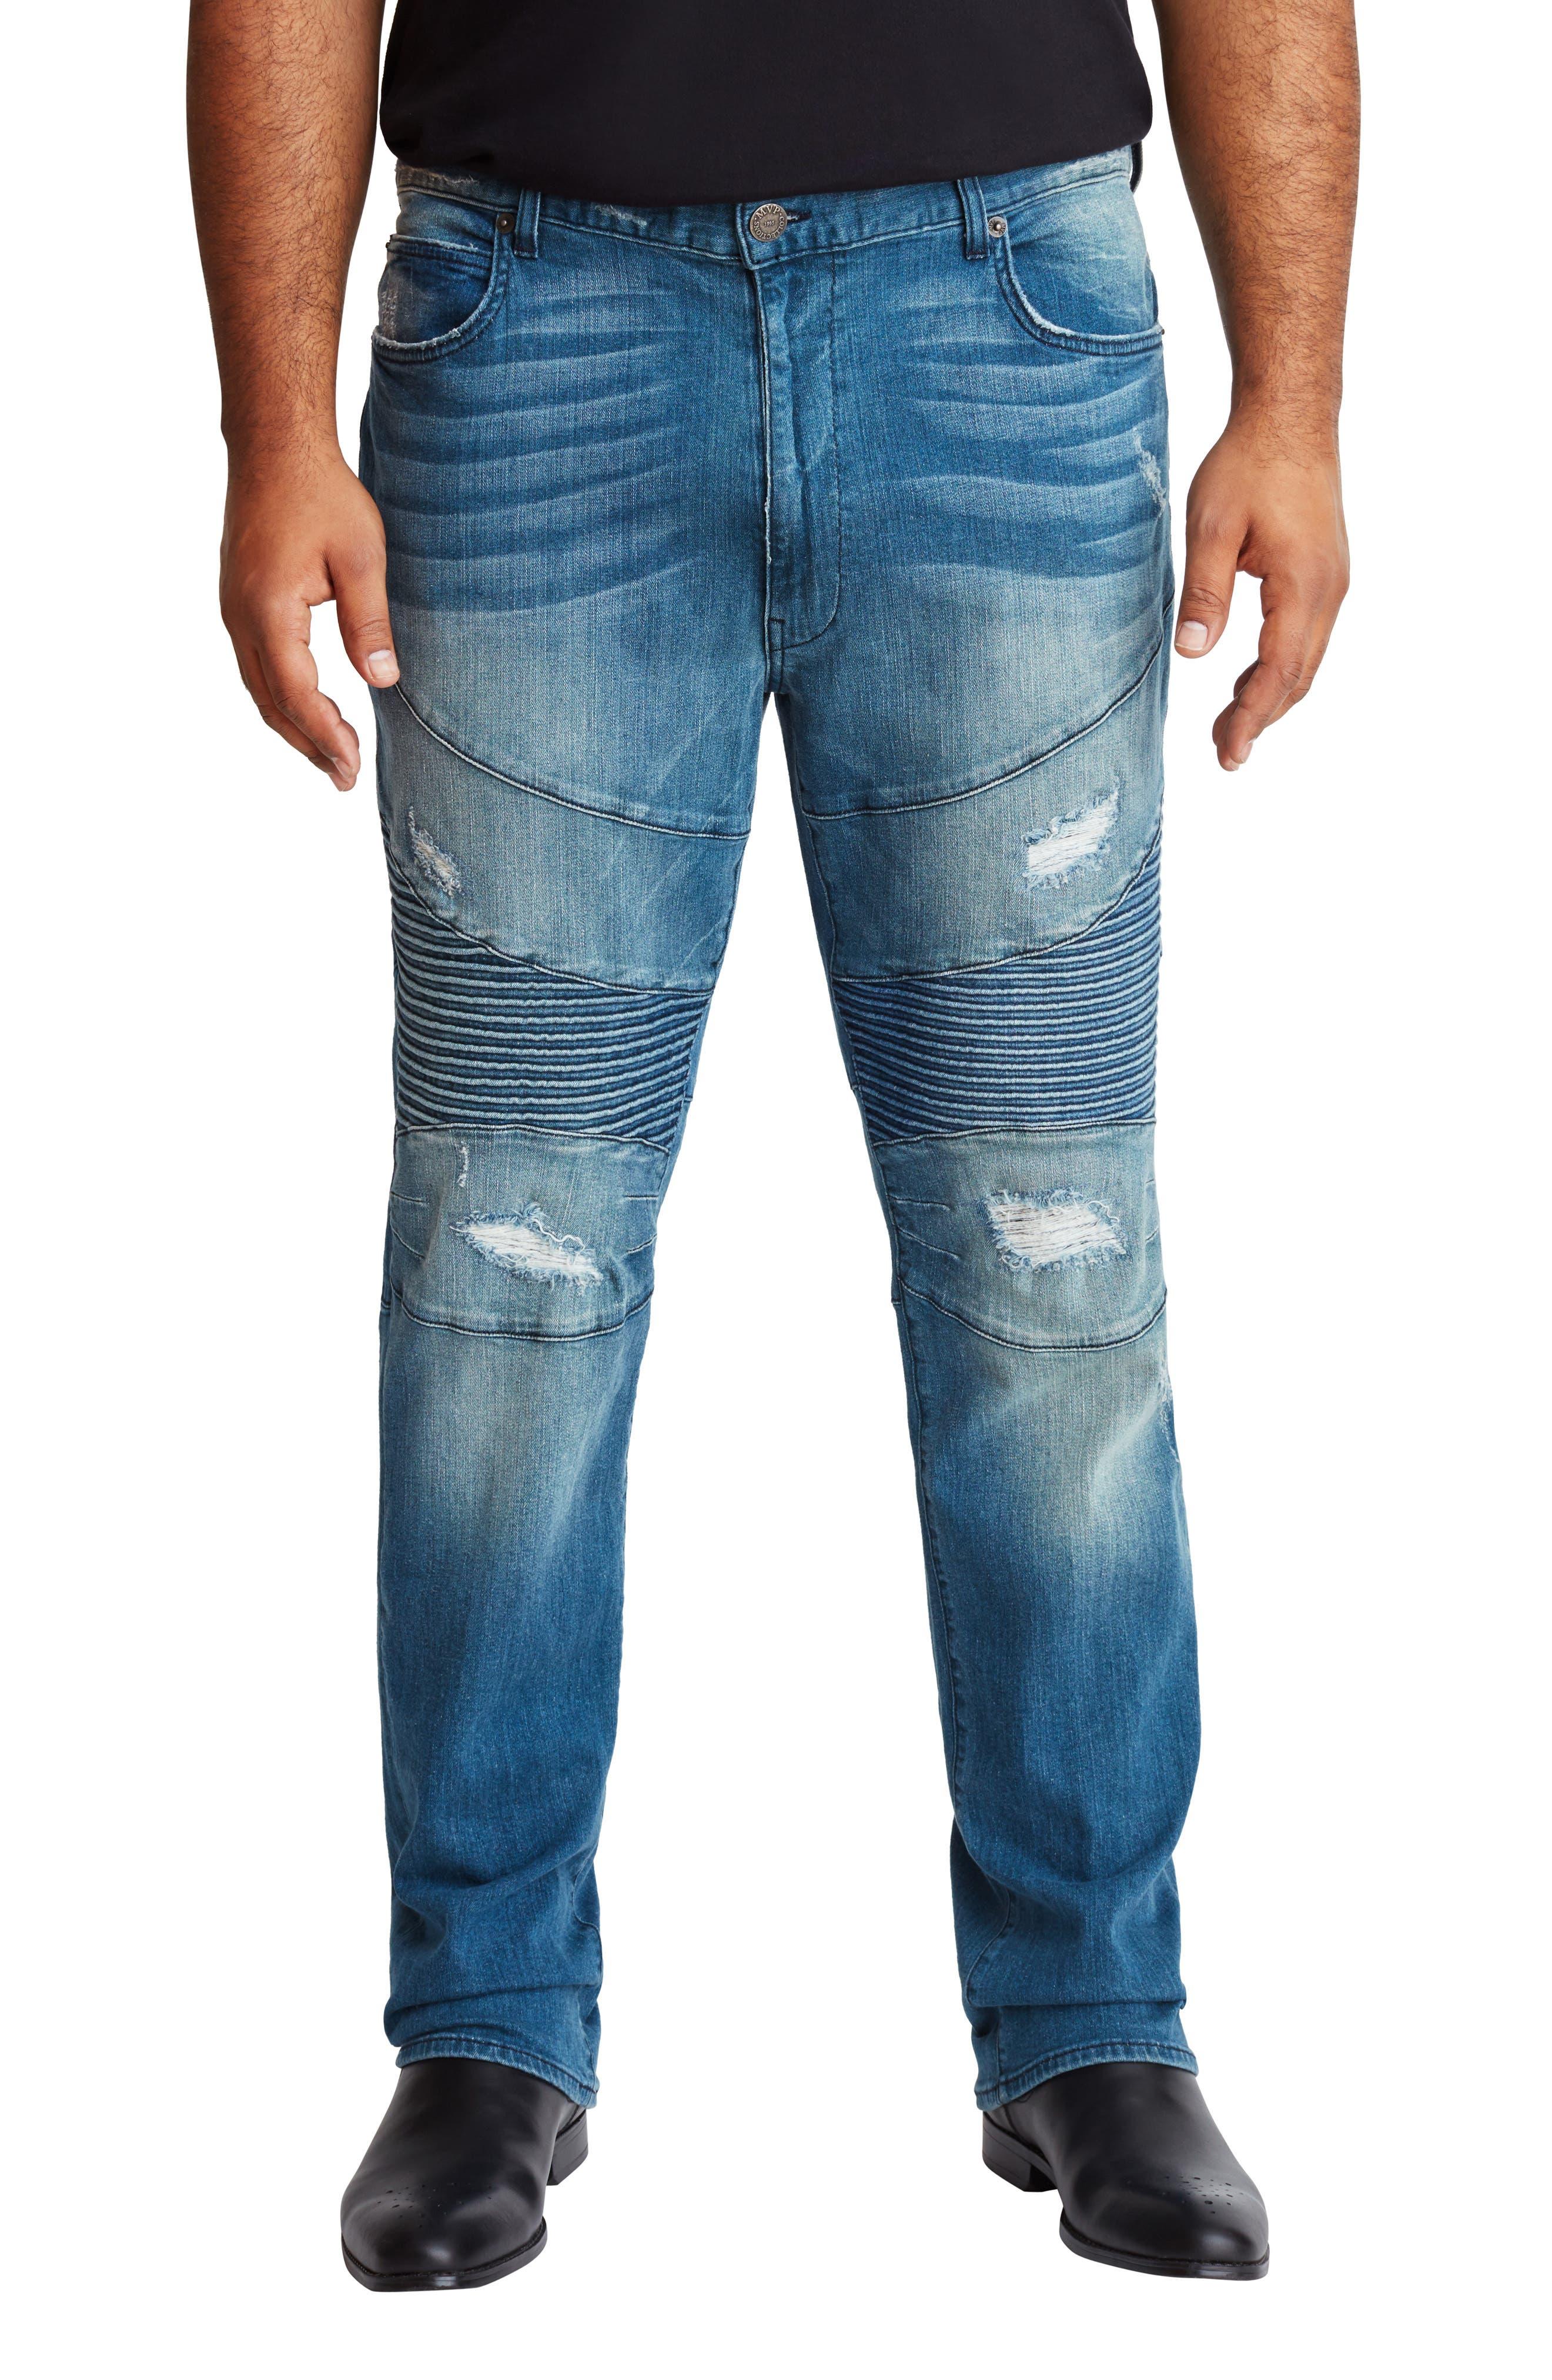 Men's MVP Collections Straight Leg Distressed Biker Jeans